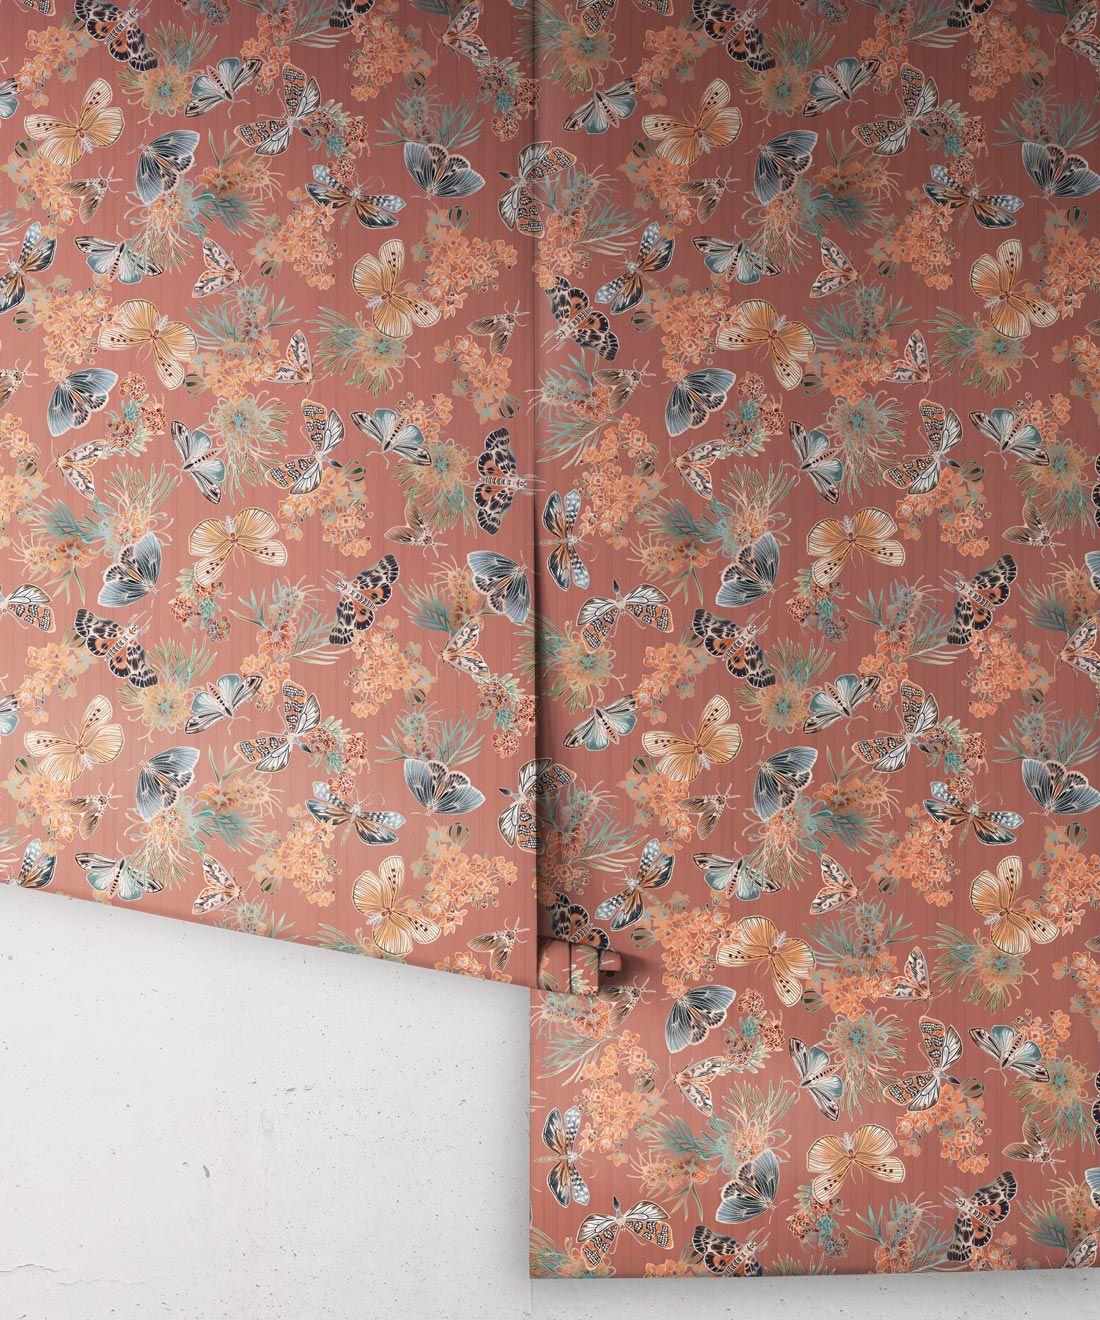 Moth Wallpaper • Eloise Short • Vintage Floral Wallpaper •Granny Chic Wallpaper • Grandmillennial Style Wallpaper •Rosewood •Rolls